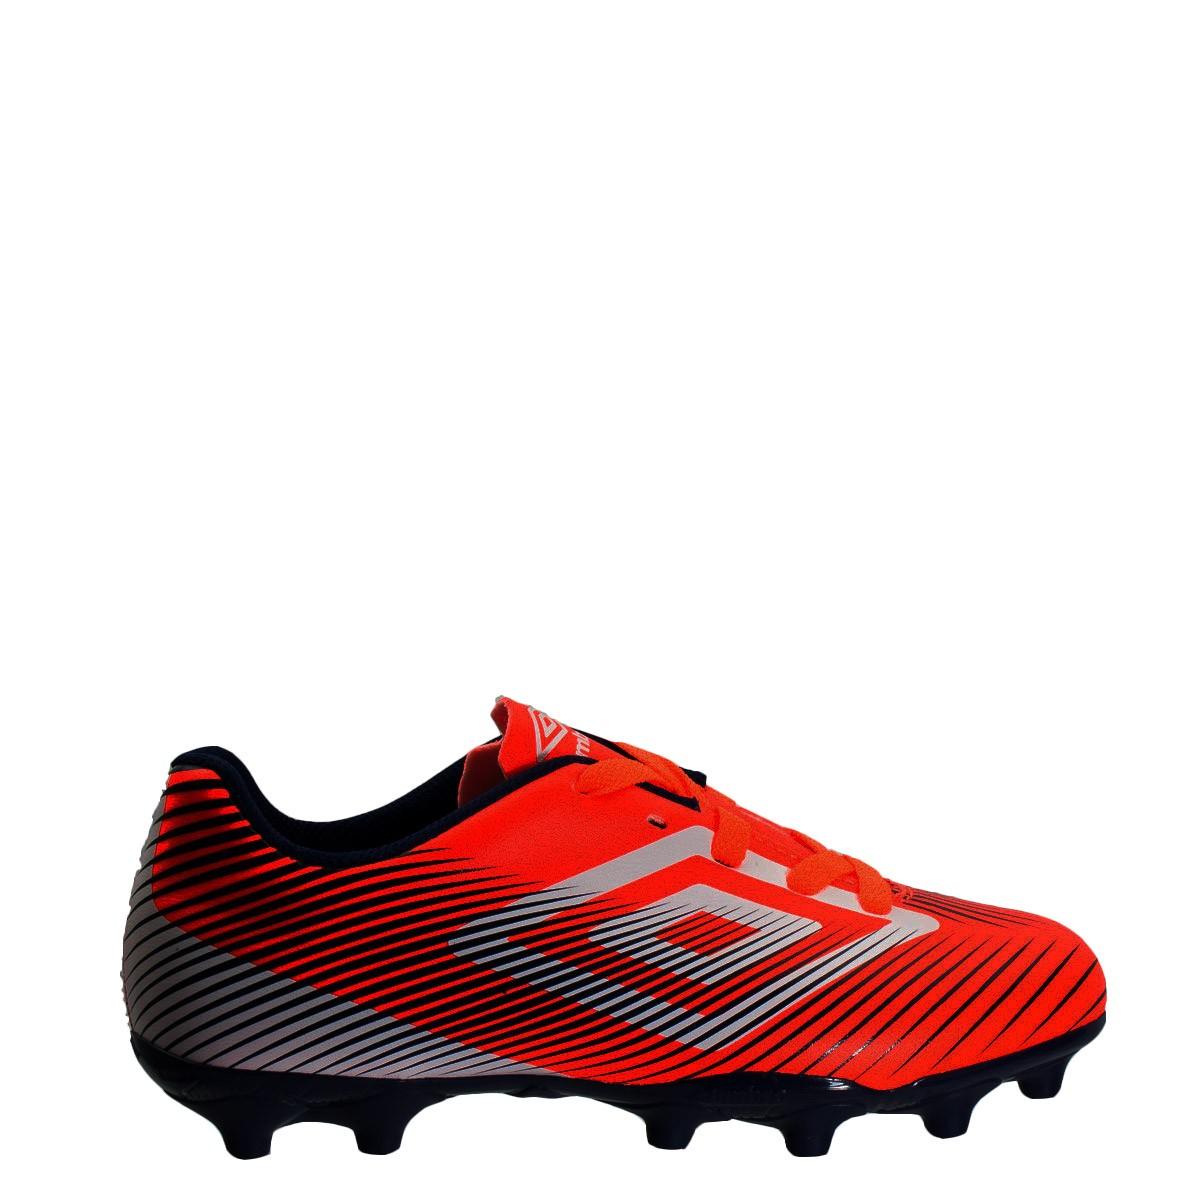 b7b4346db6 Bizz Store - Chuteira Infantil Futebol de Campo Umbro Speed II JR